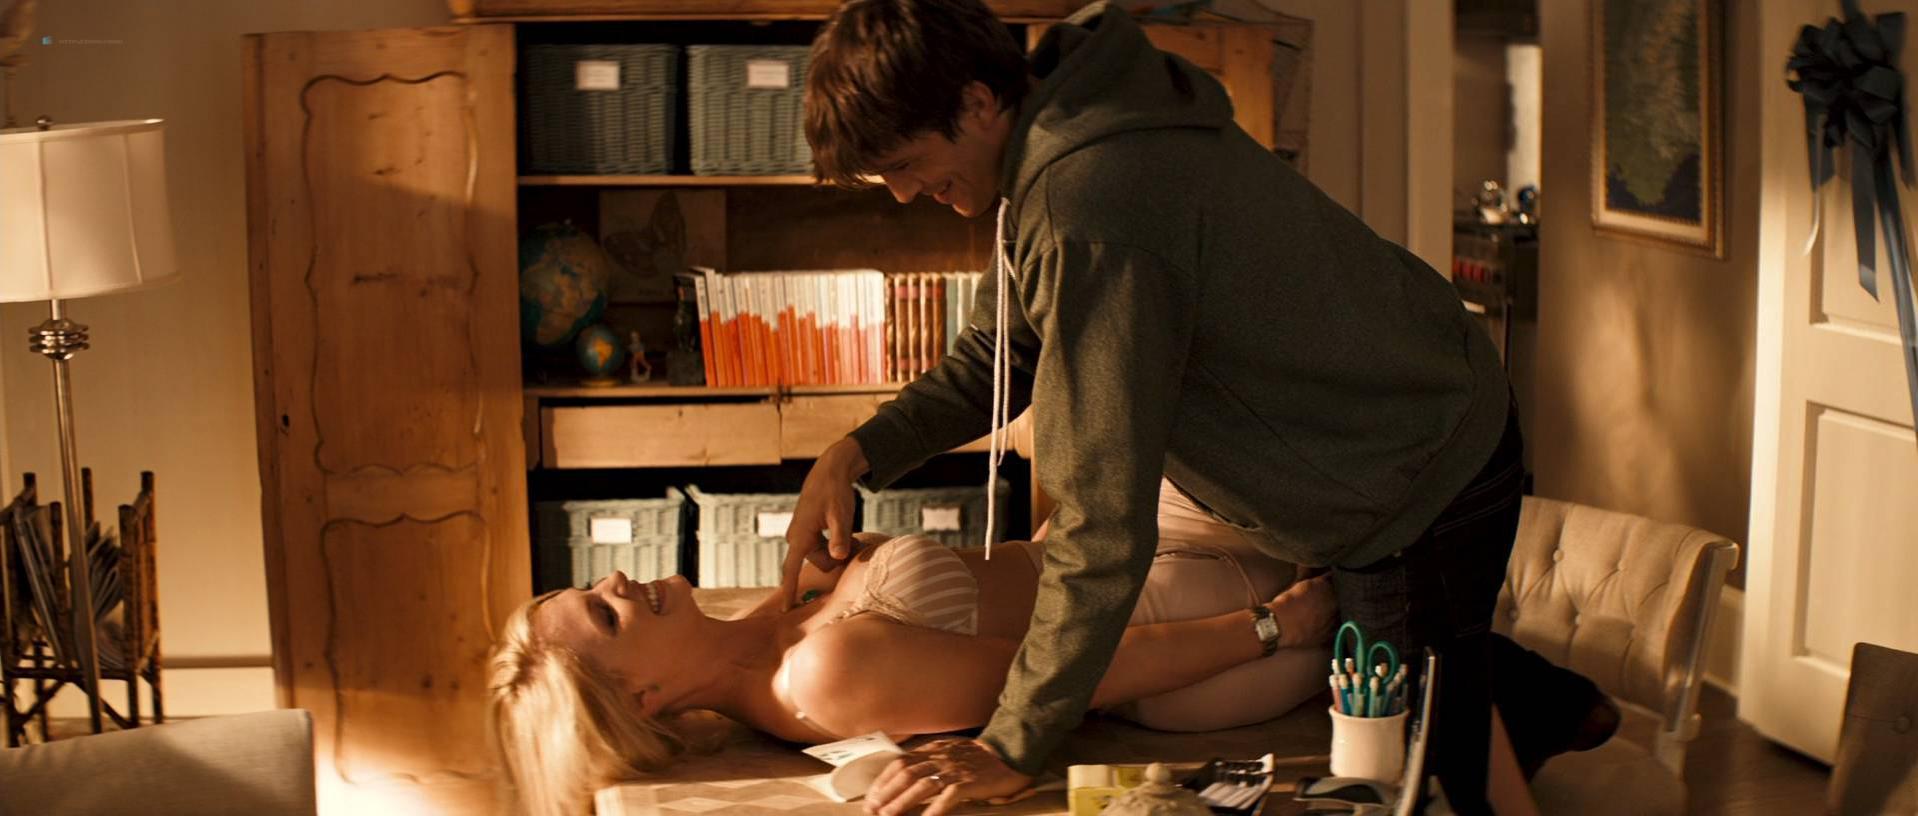 Katherine Heigl sexy - Killers (2010)